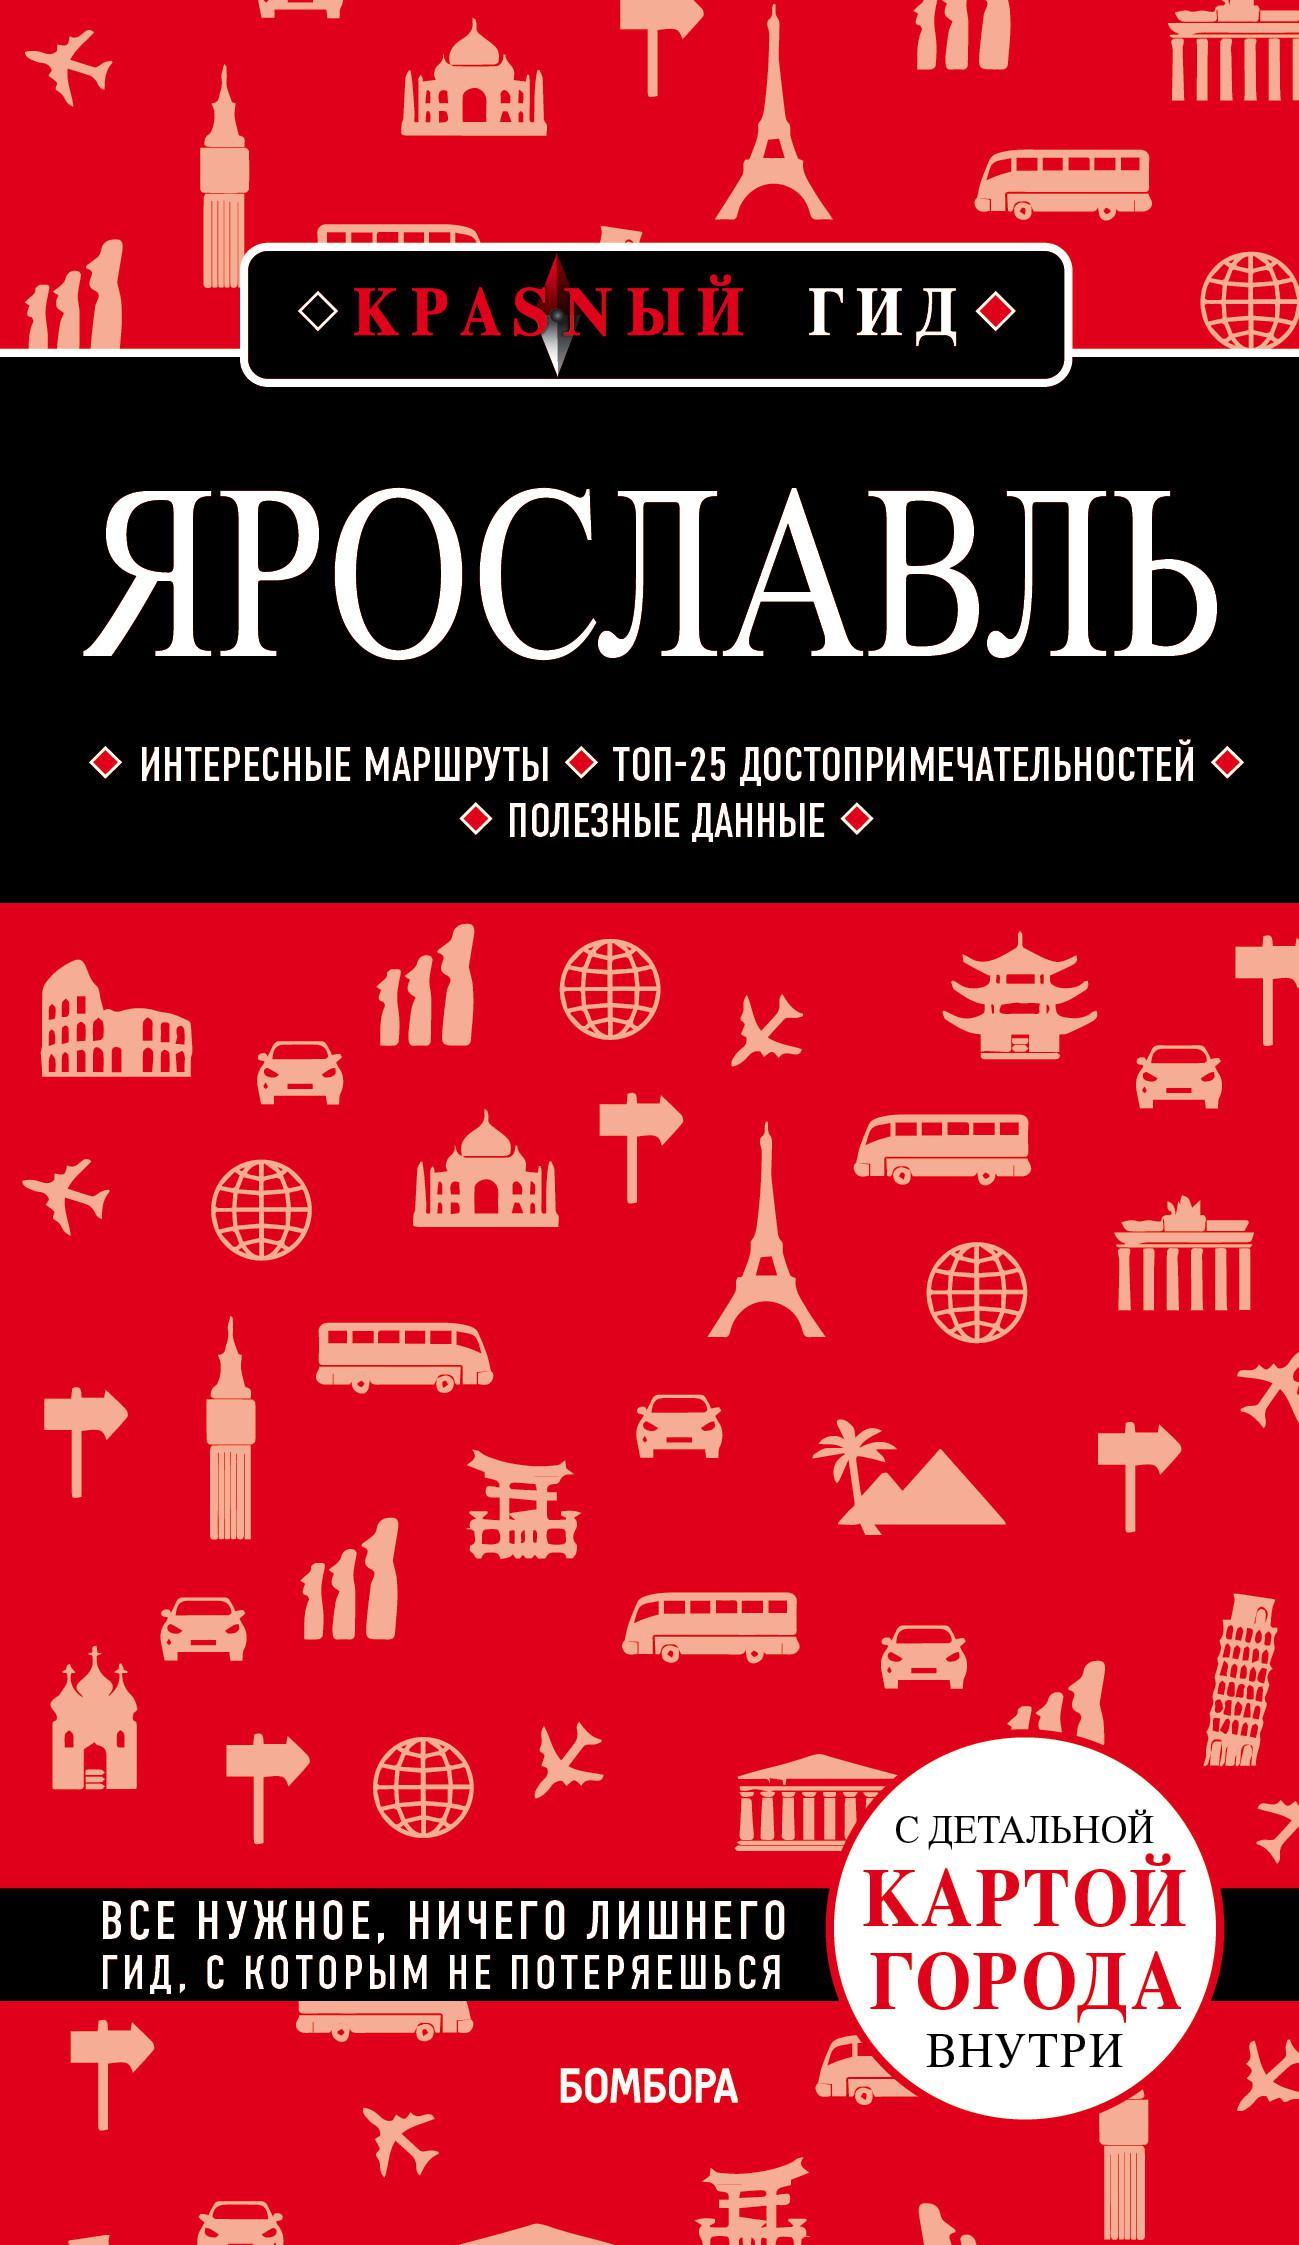 Ярославль. 3-е изд. испр. и доп.